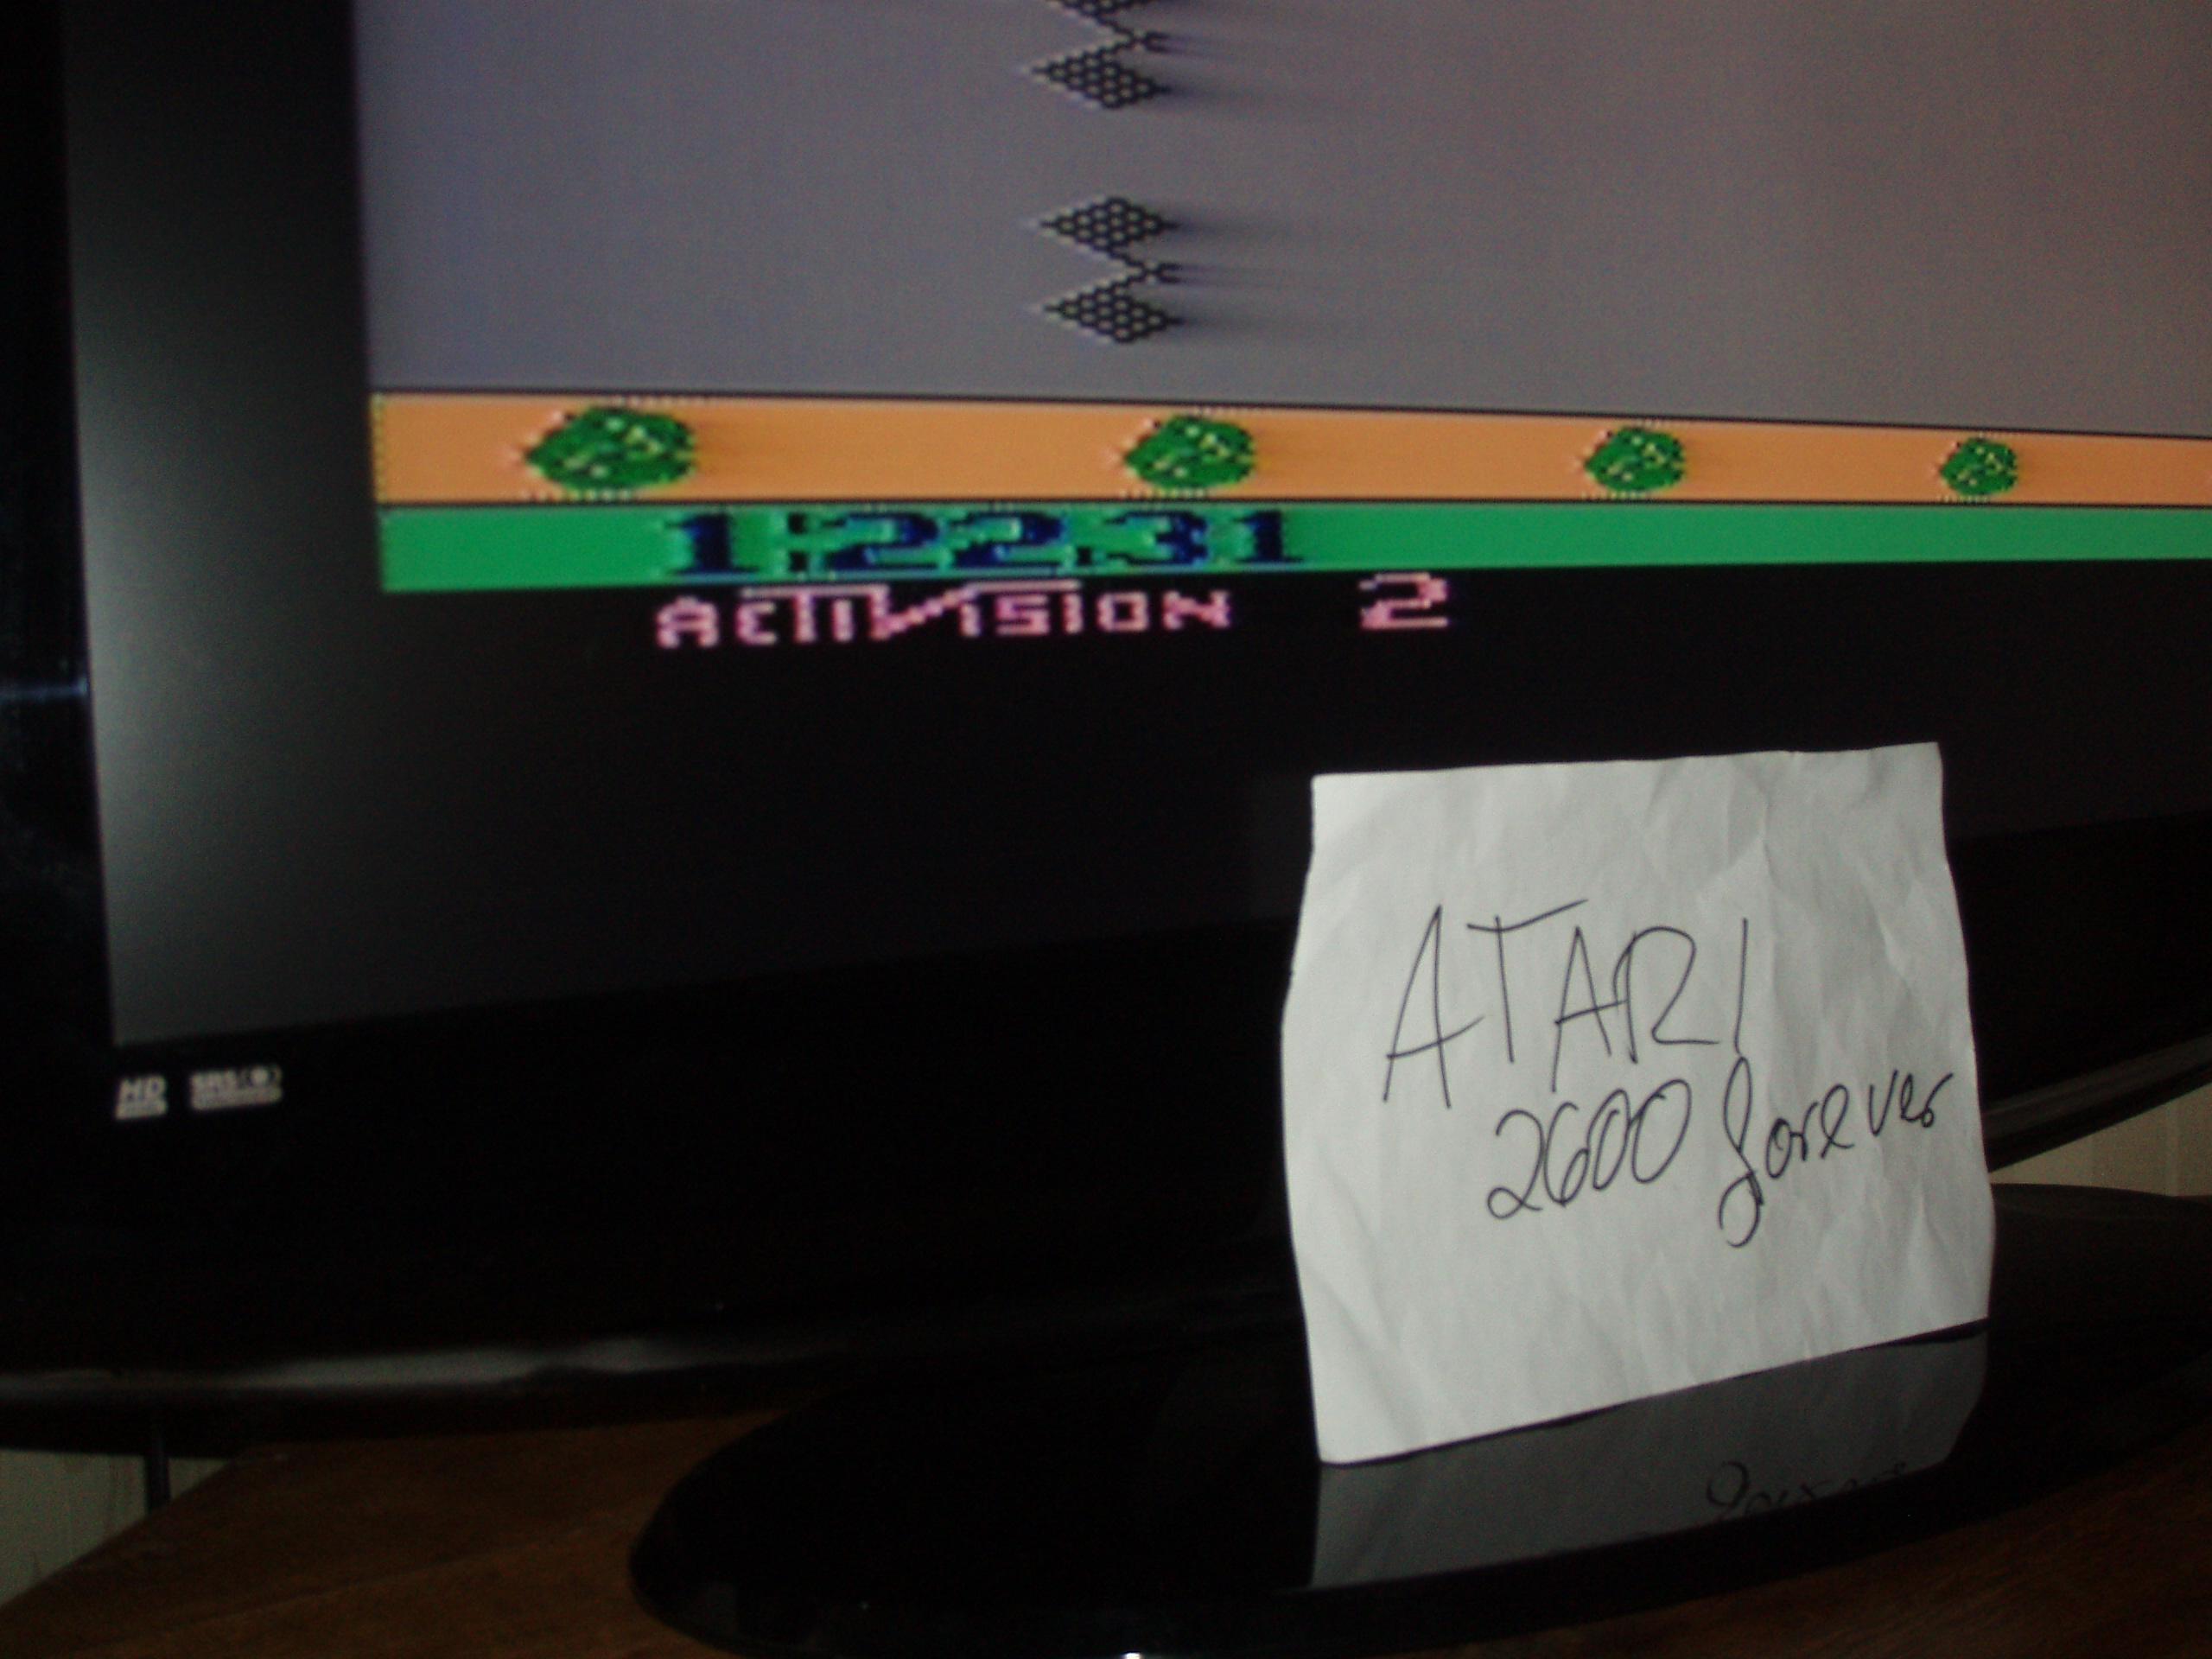 atari2600forever: Grand Prix: Game 2 (Atari 2600 Novice/B) 0:01:22.31 points on 2018-12-18 03:36:44